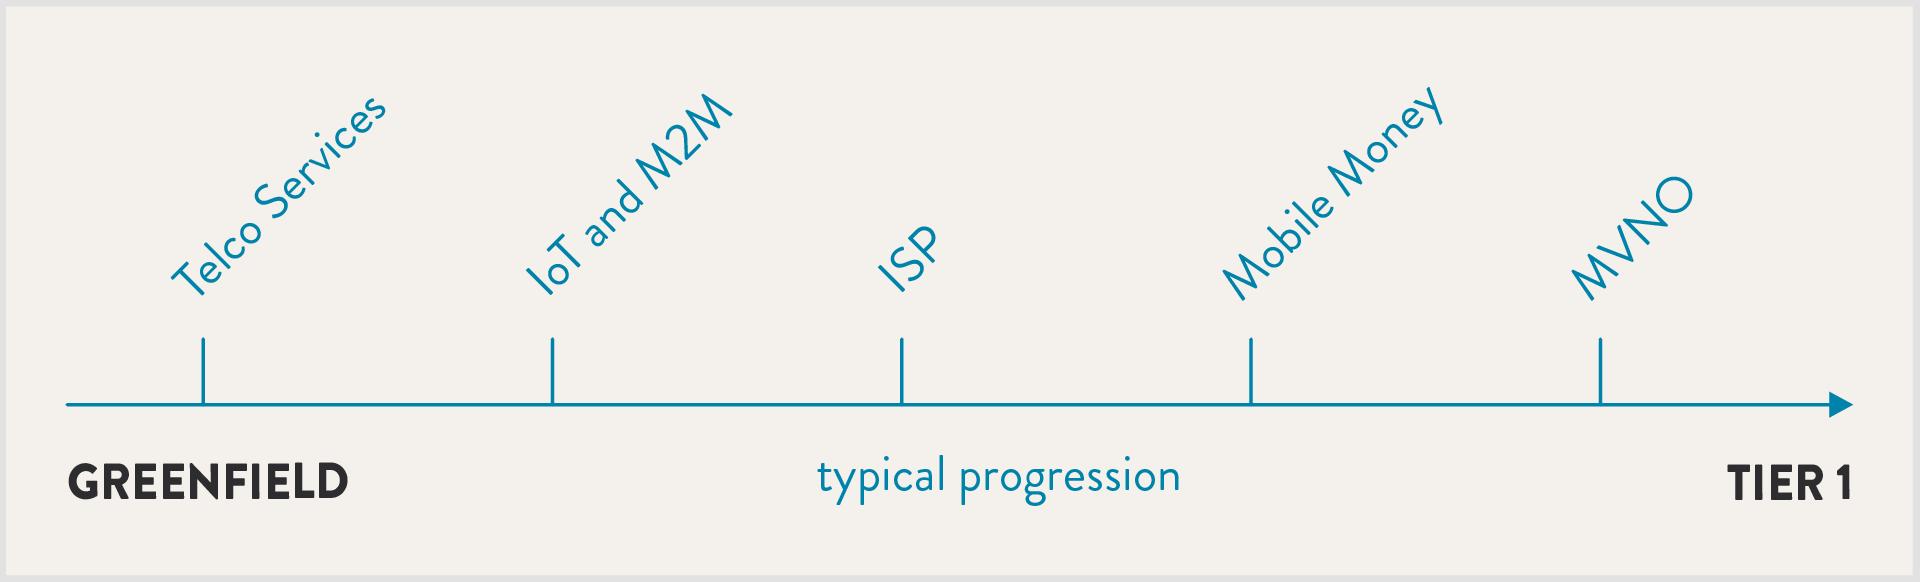 progression